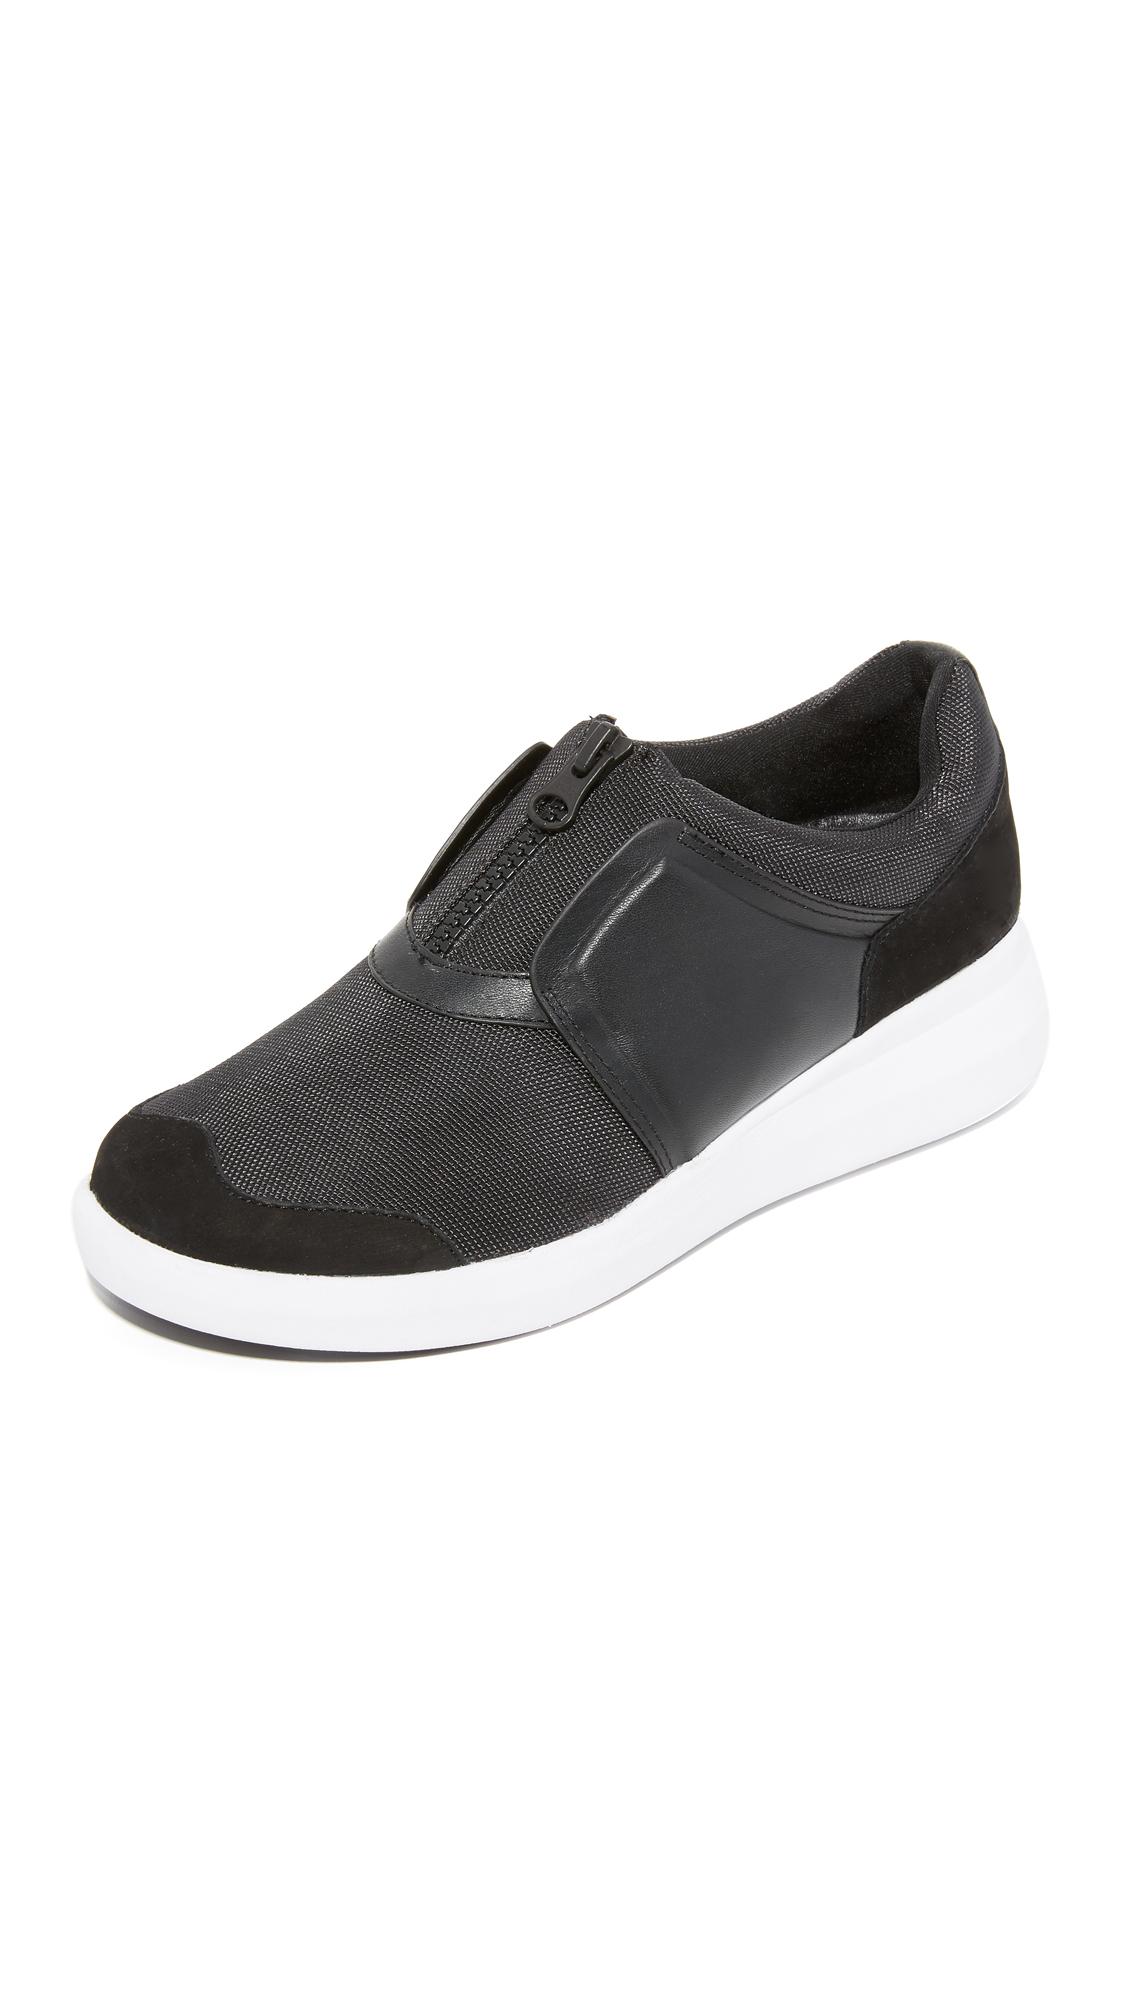 Dkny Taylor Zip On Sneakers - Black at Shopbop